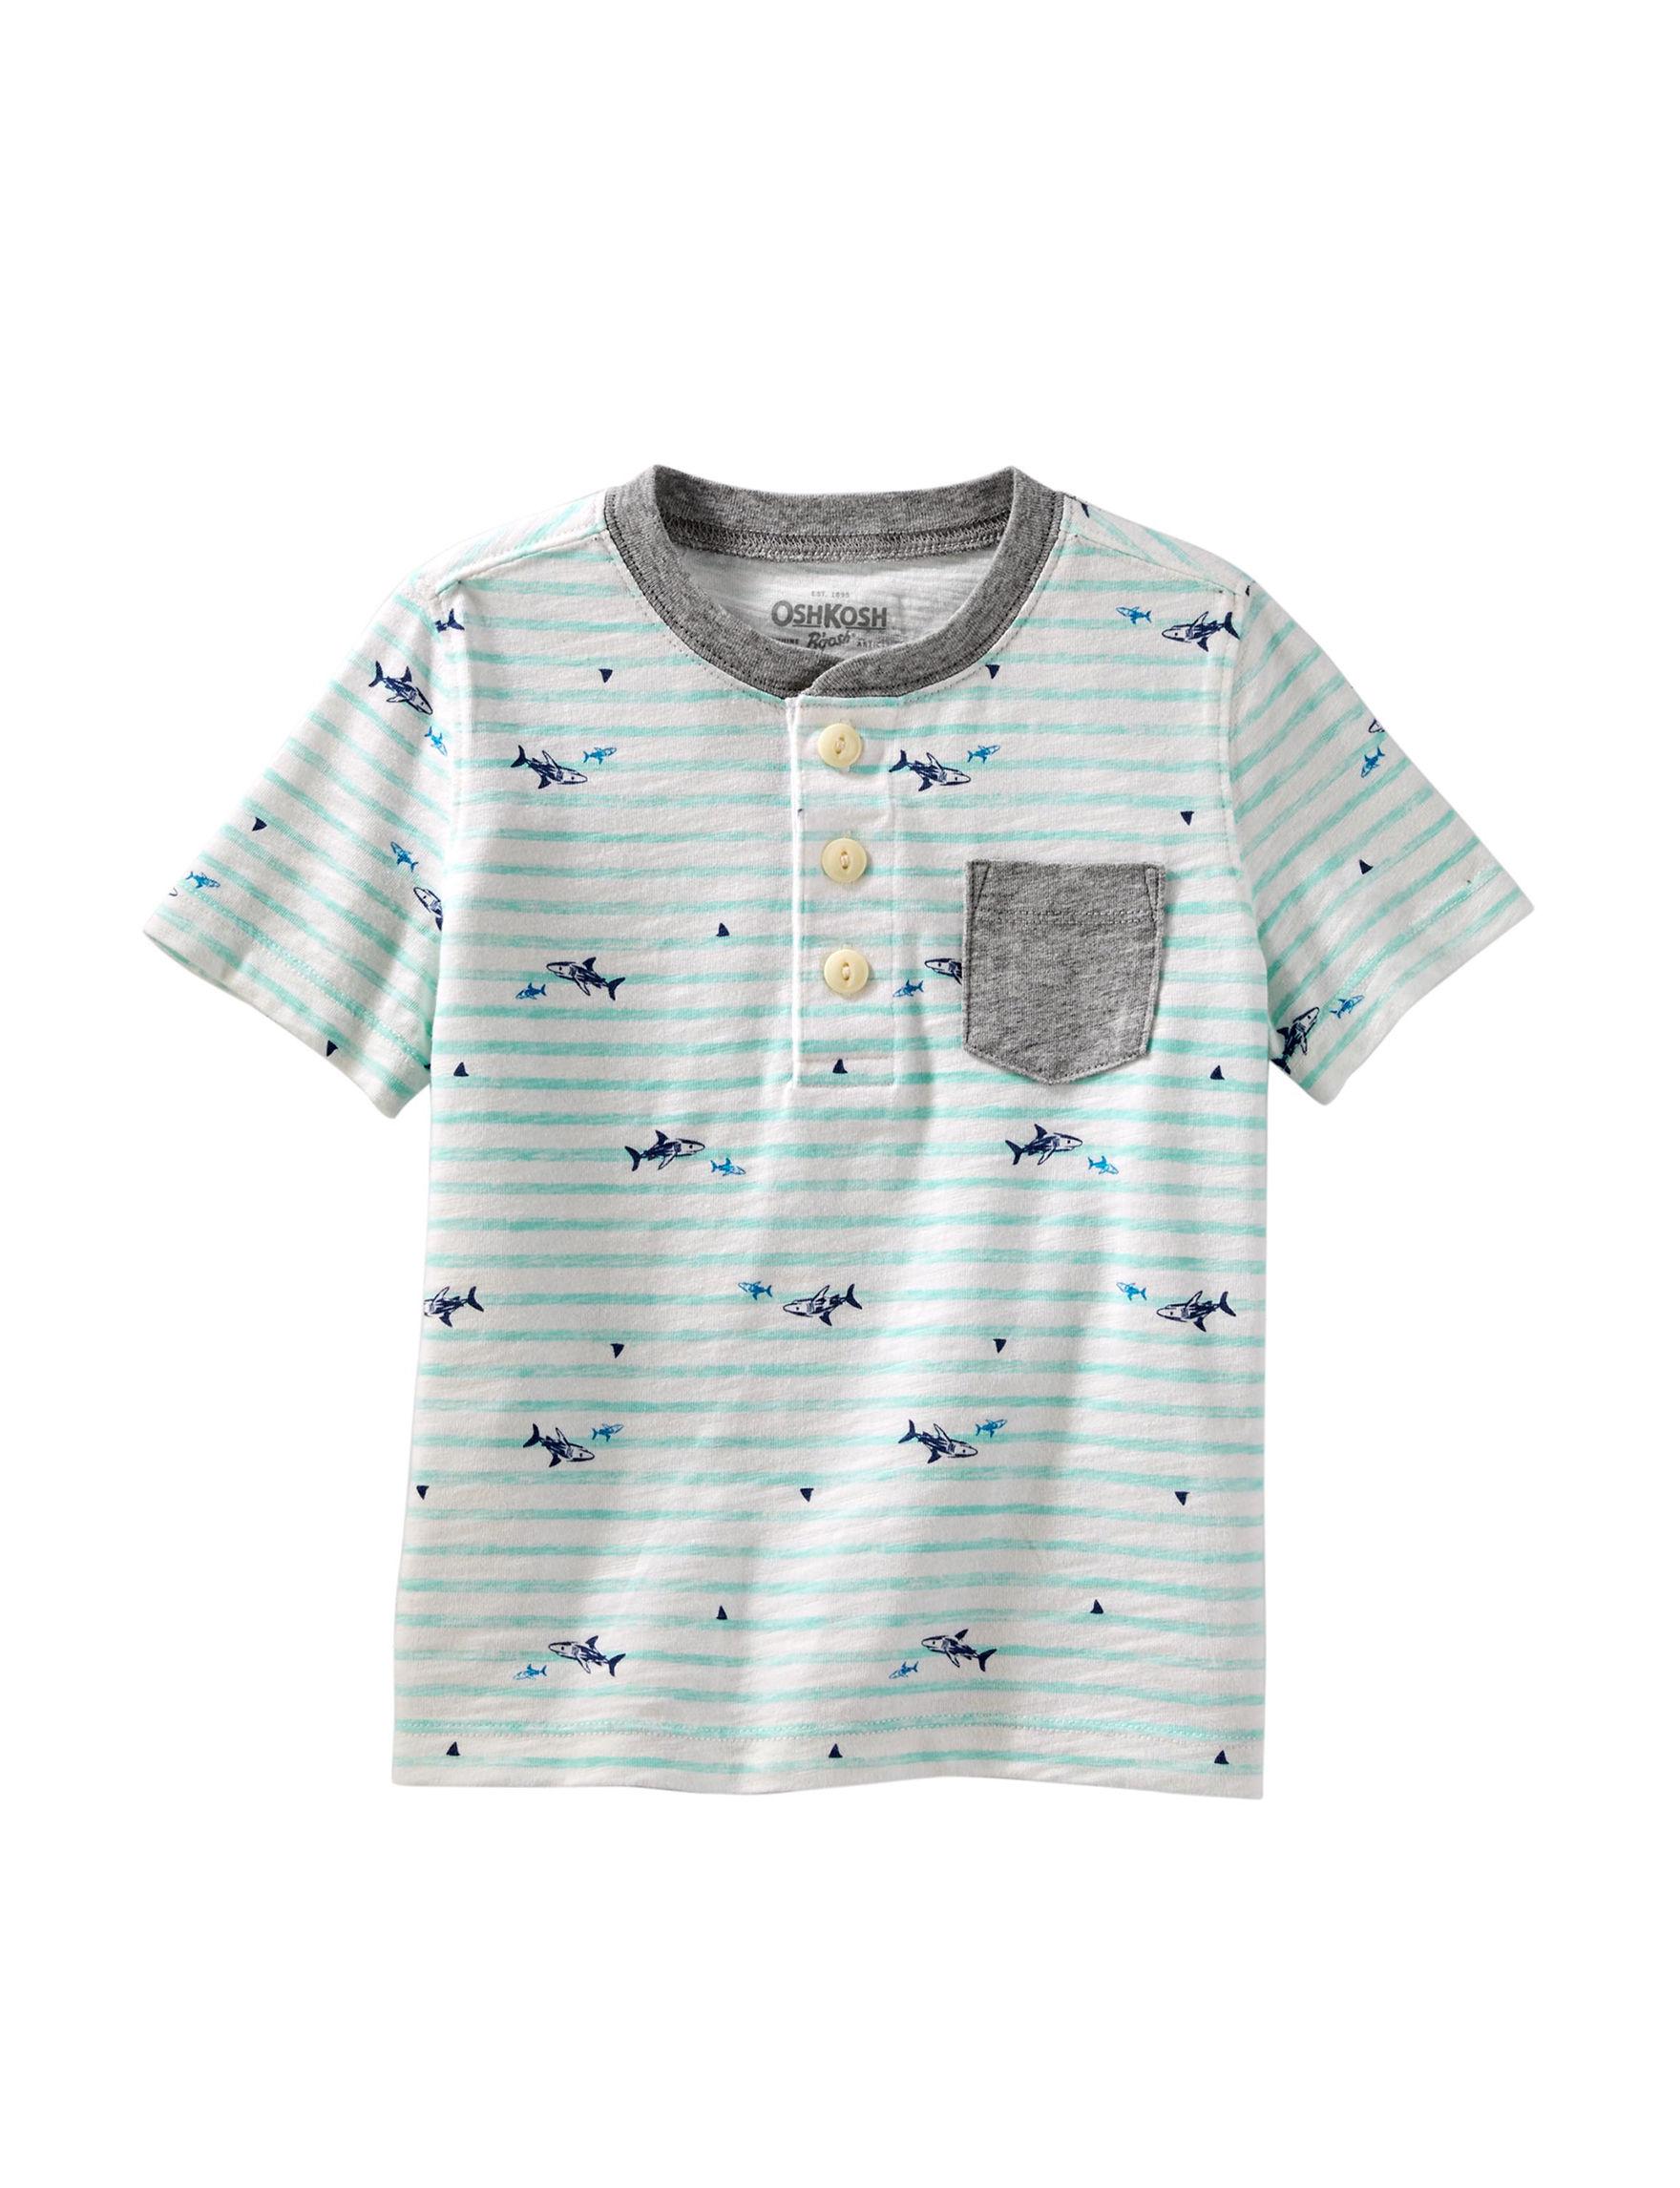 de4e32a4 OshKosh B'gosh Striped Shark Henley T-Shirt - Toddler Boys   Stage ...